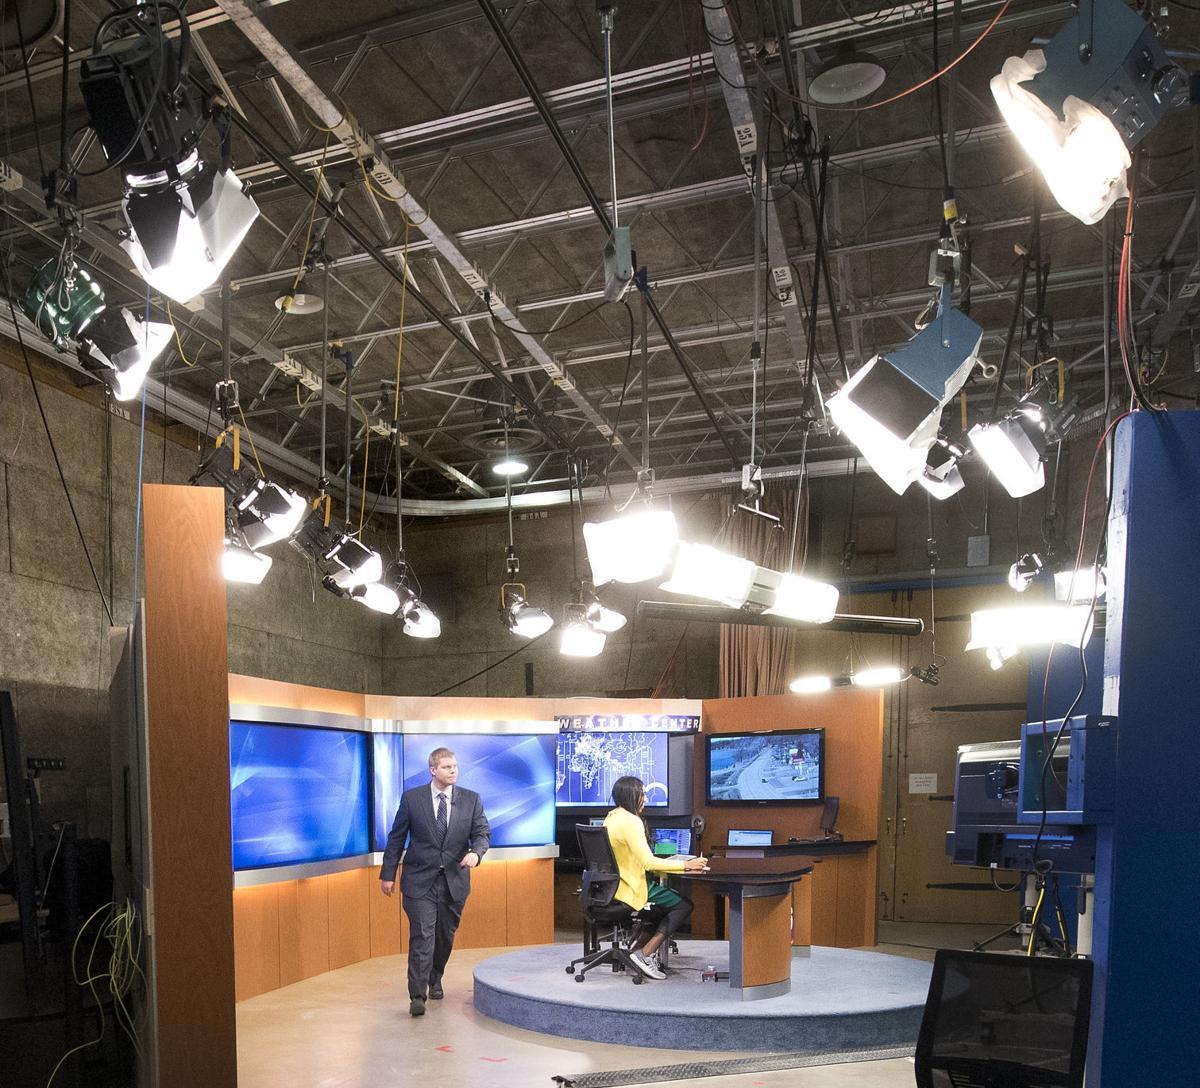 KCAU television new studio